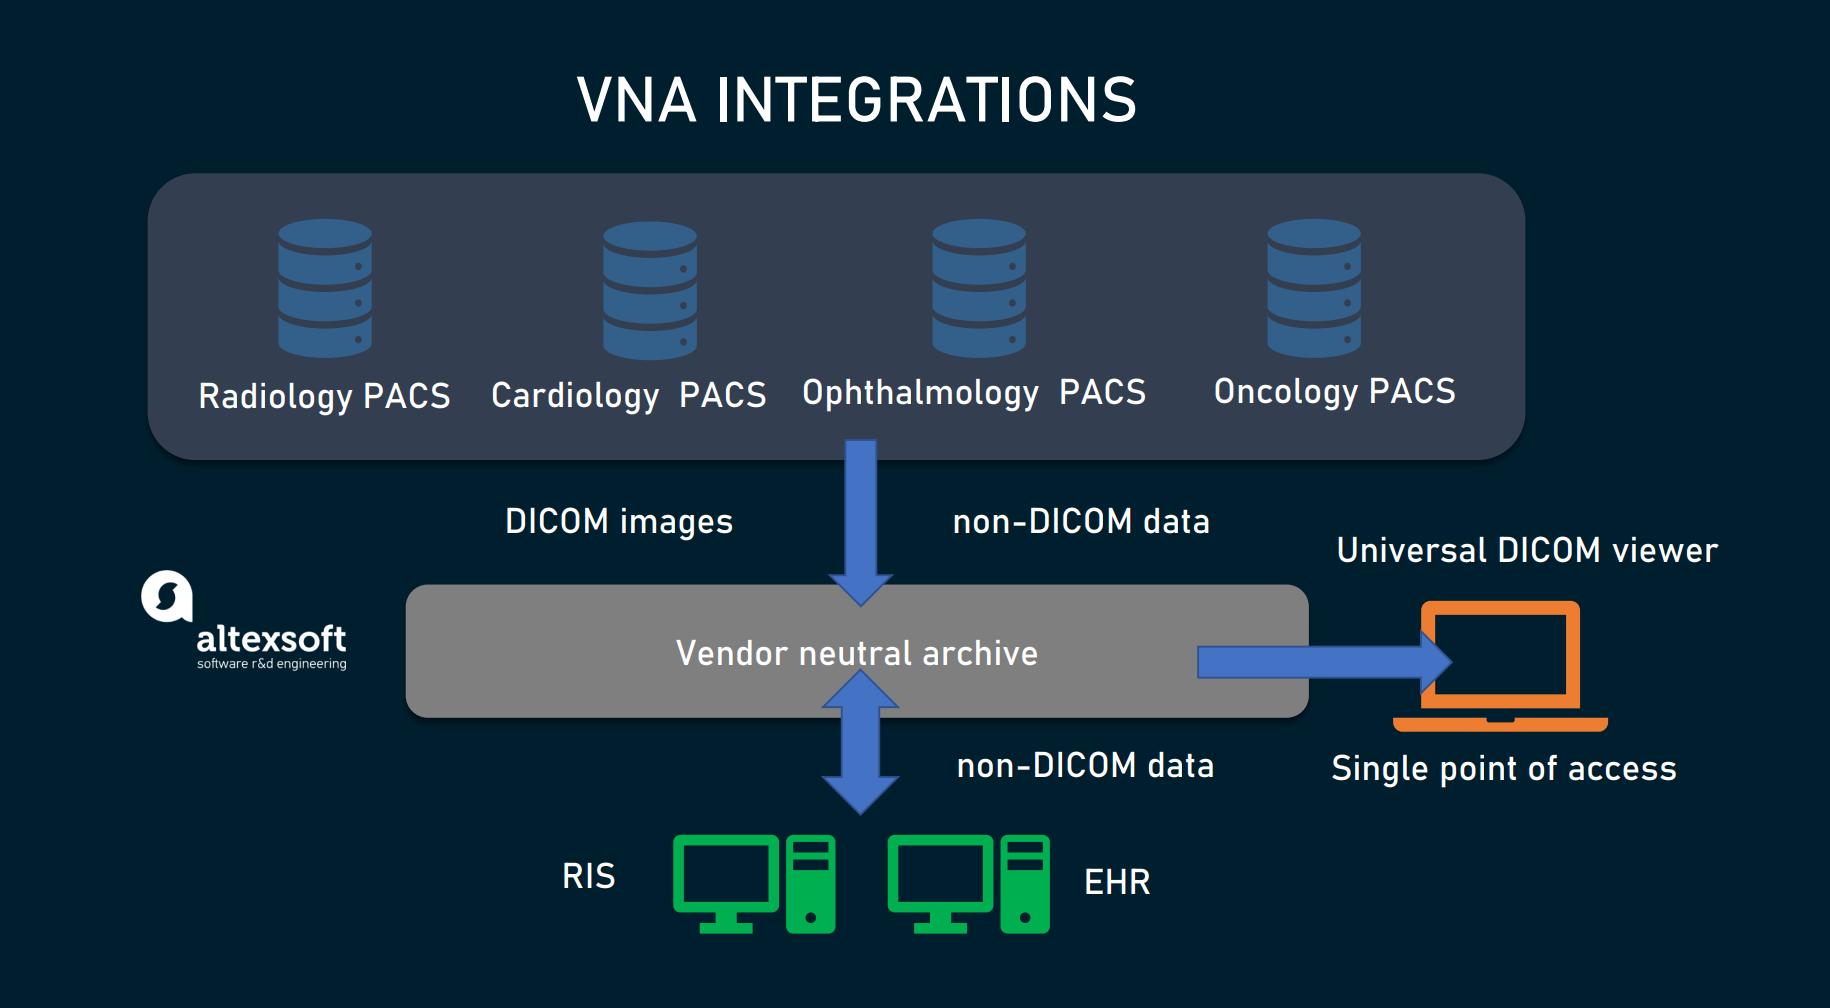 VNA integrations